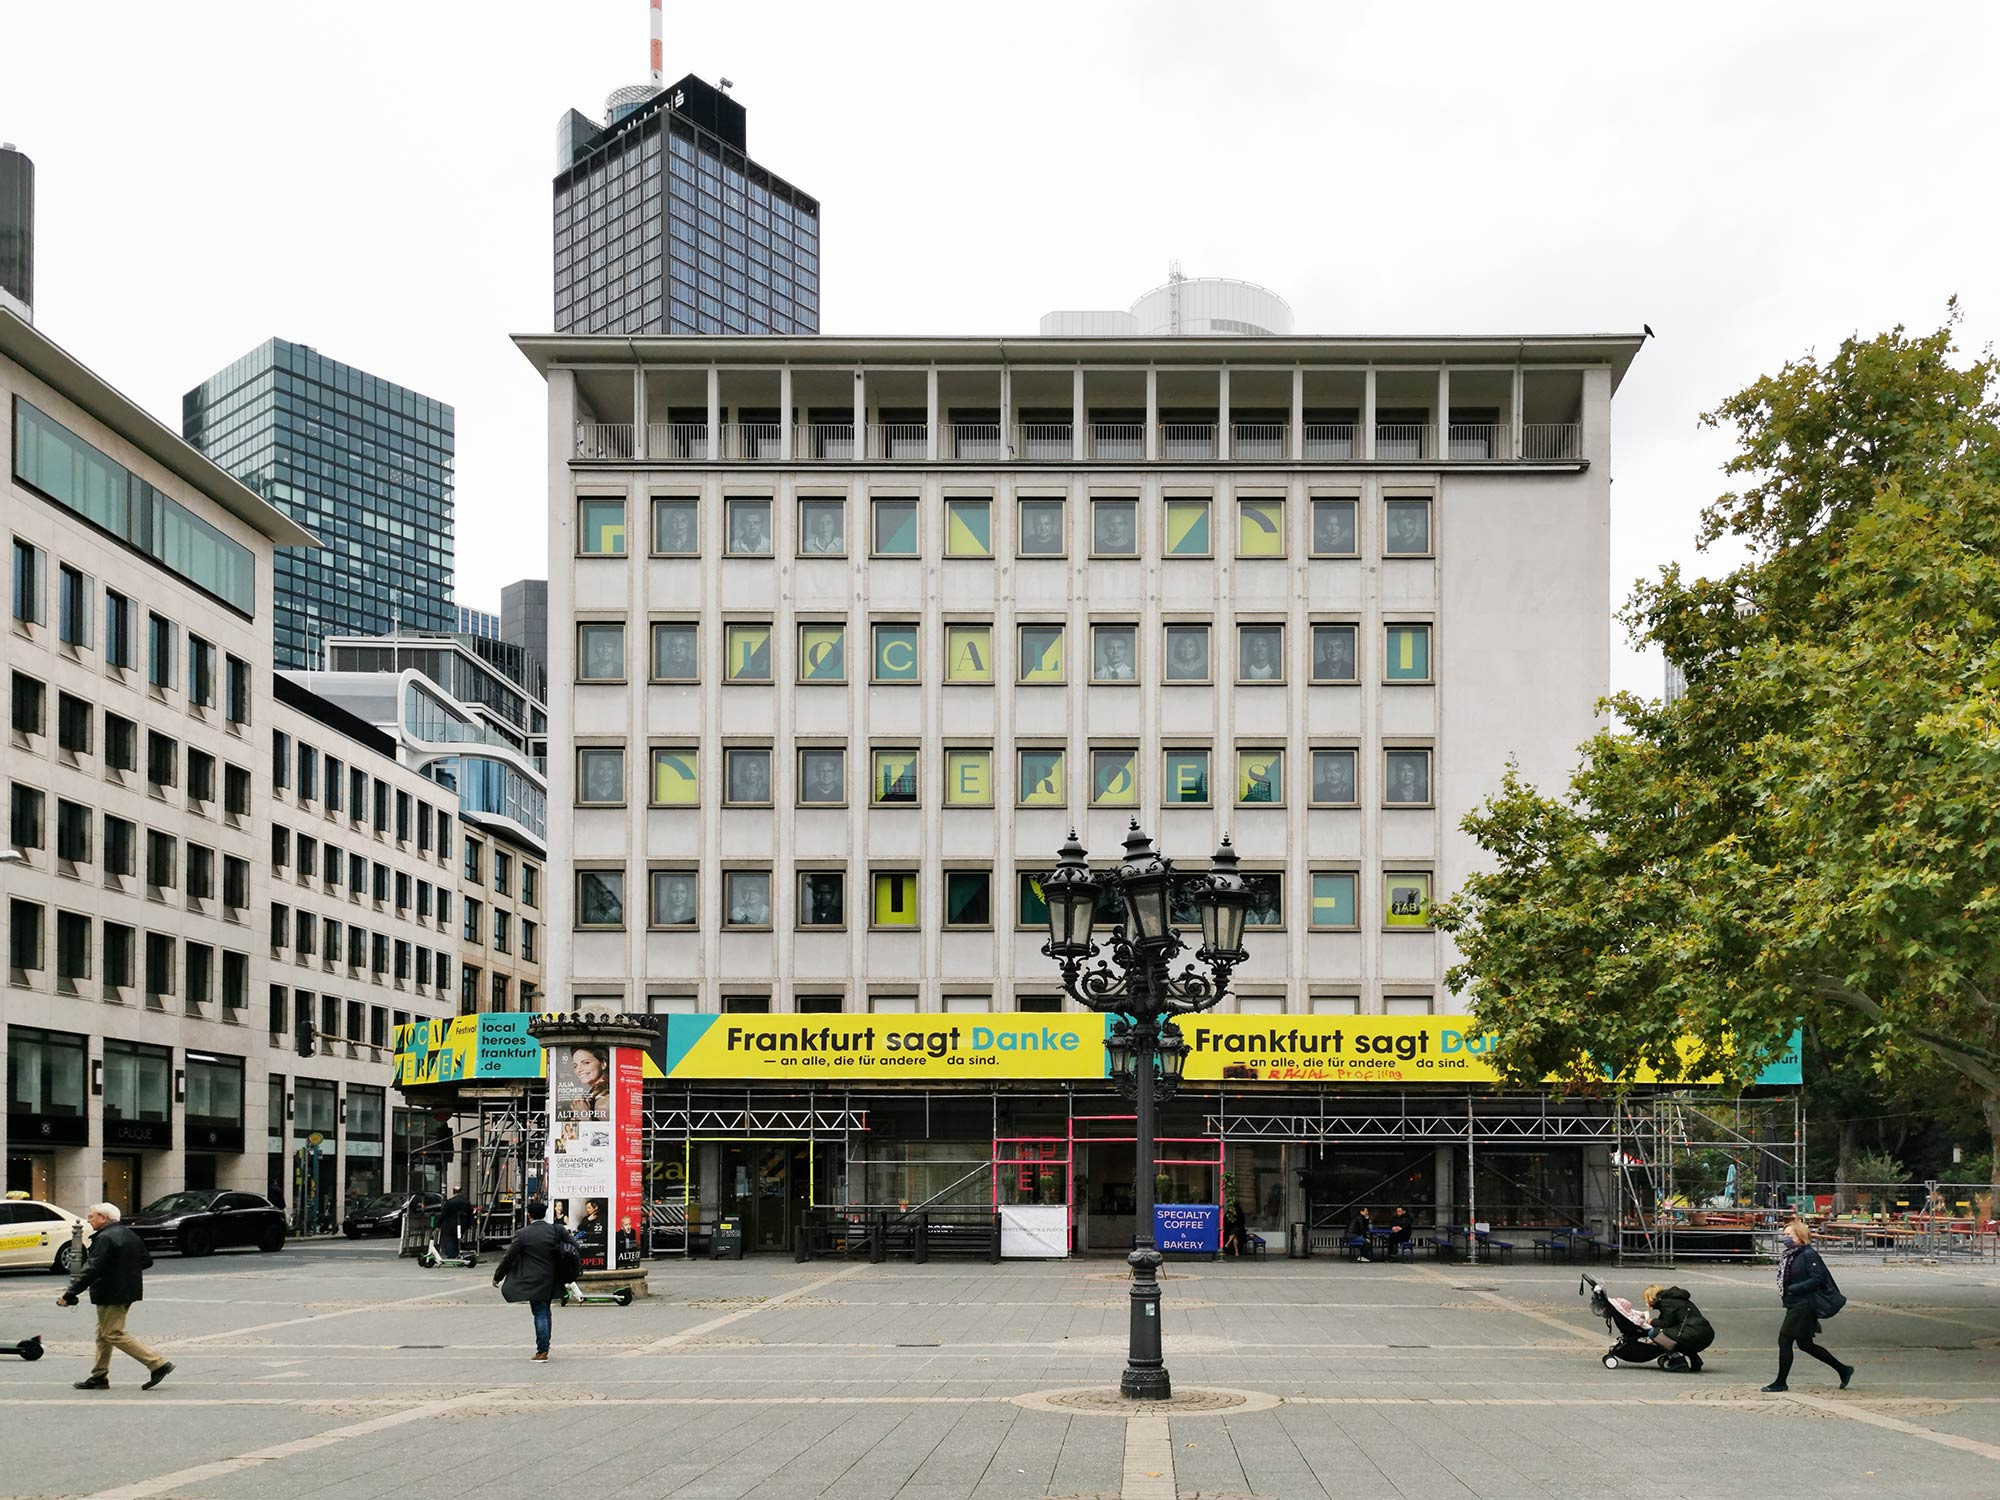 Opernplatz 2 Frakfurt - Neues Hochhaus am Opernplatz - SIGNA Prime - RFR Holding - Popup Restaurants im Haus Opernplatz 2